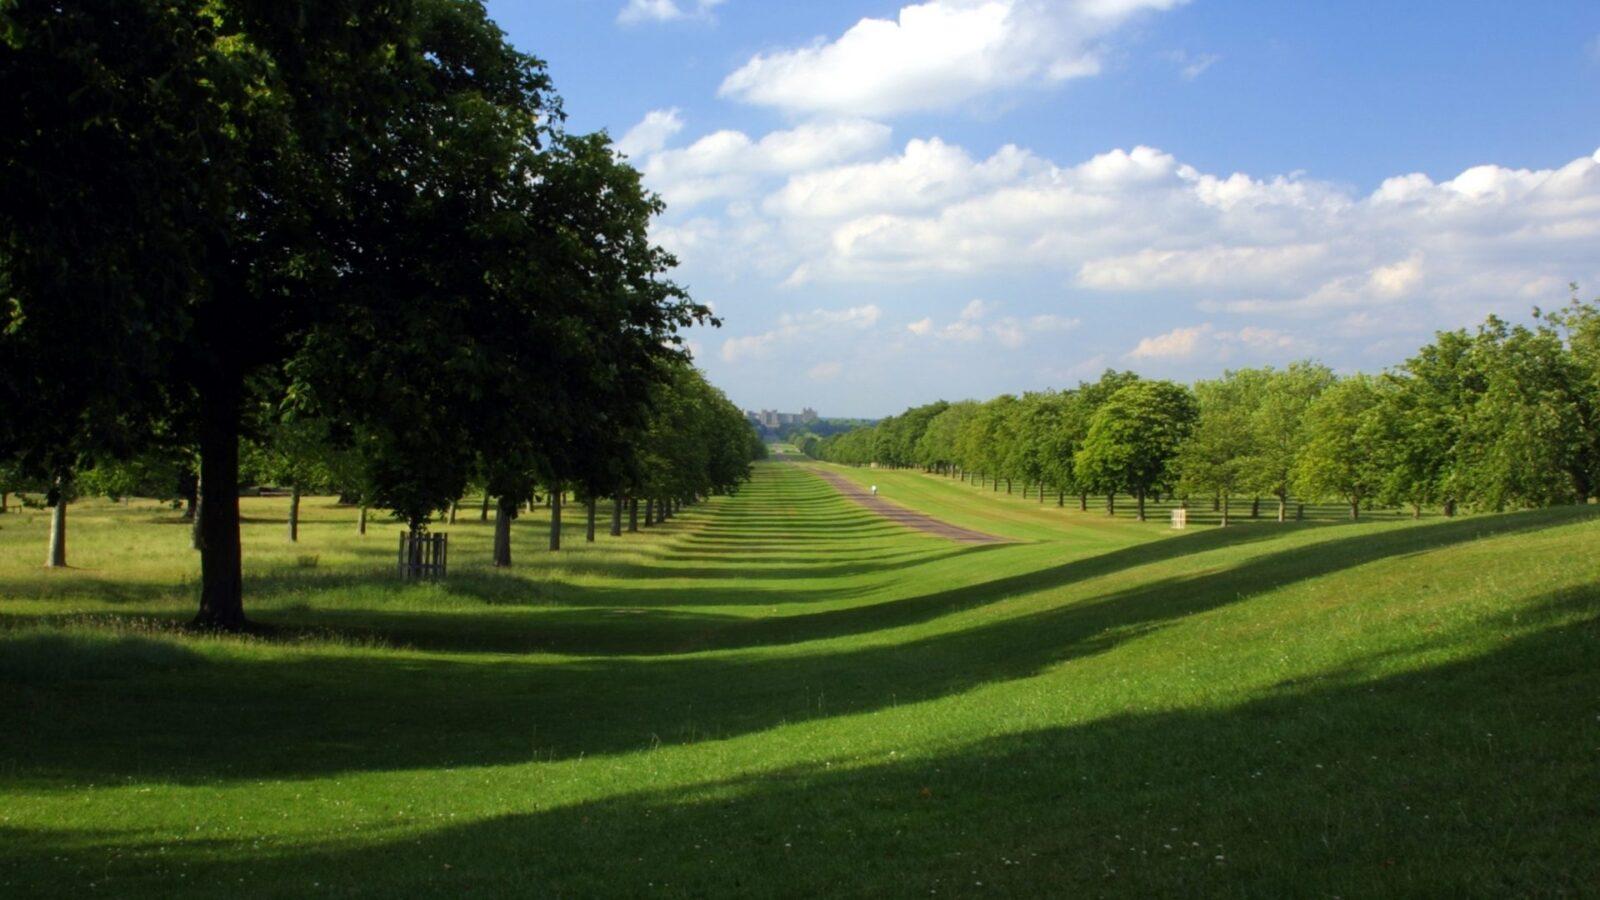 windsor garden dorchester collection summer 2019 ideas what to do